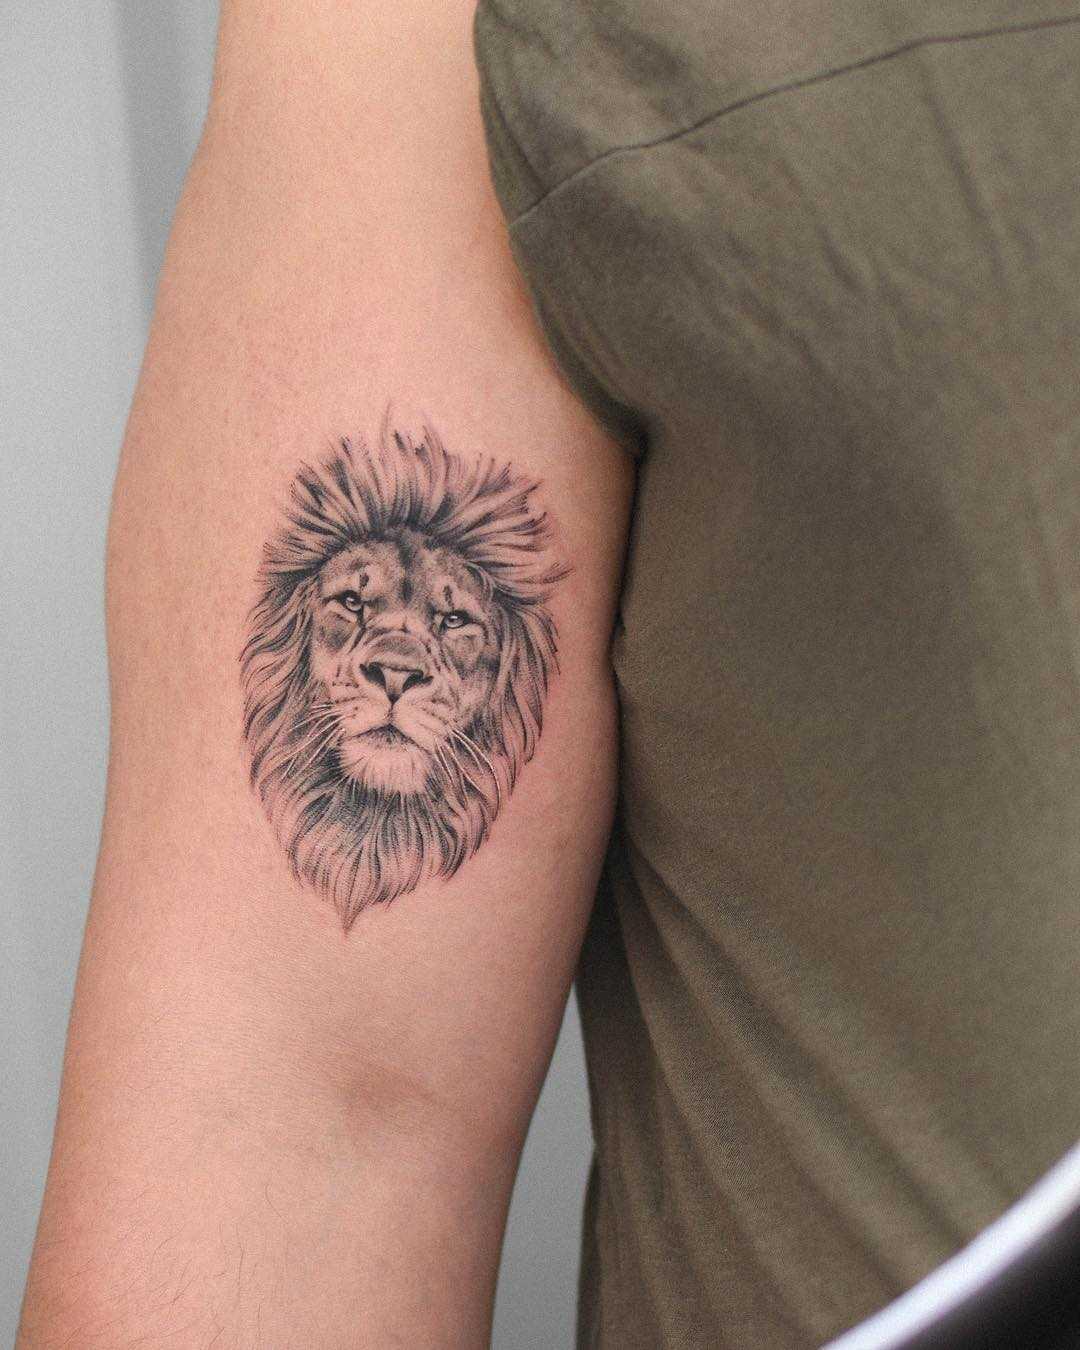 Hyper realistic lion tattoo